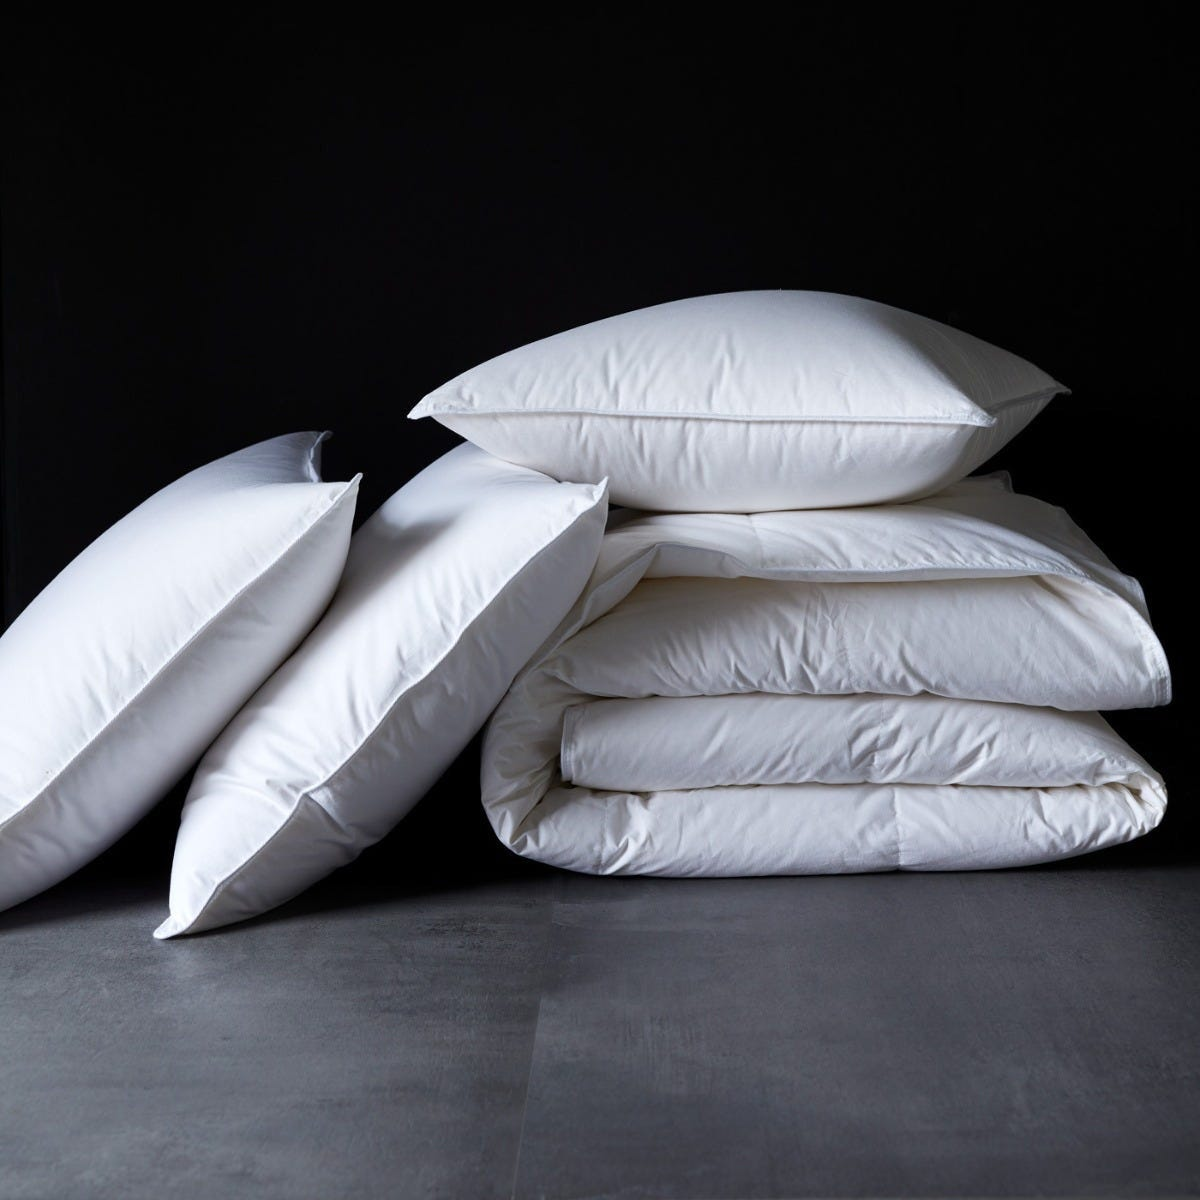 Bedding Inserts